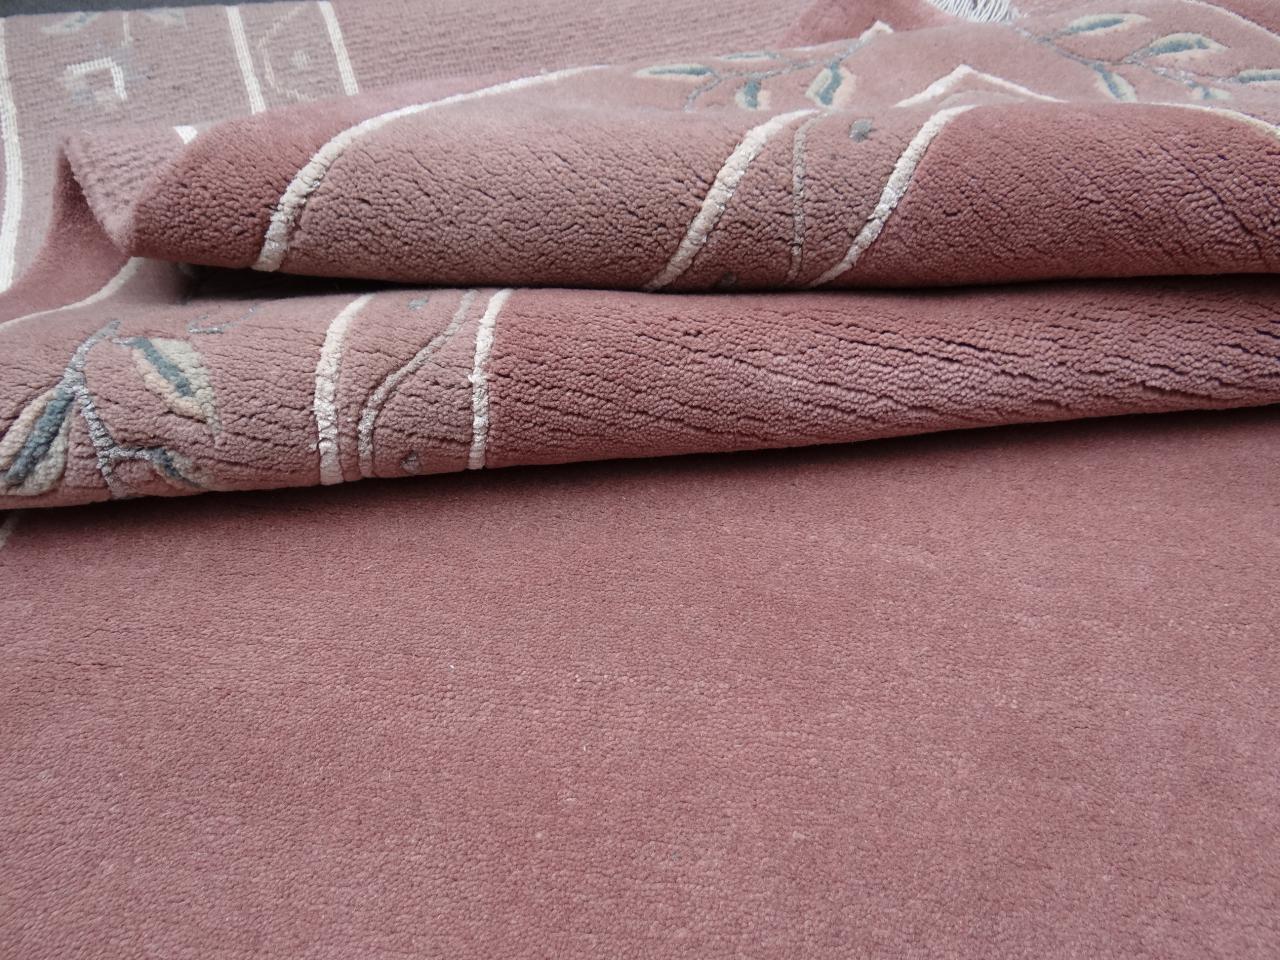 agra classica vieux rose tapis contemporains n 1834 305x203cm. Black Bedroom Furniture Sets. Home Design Ideas